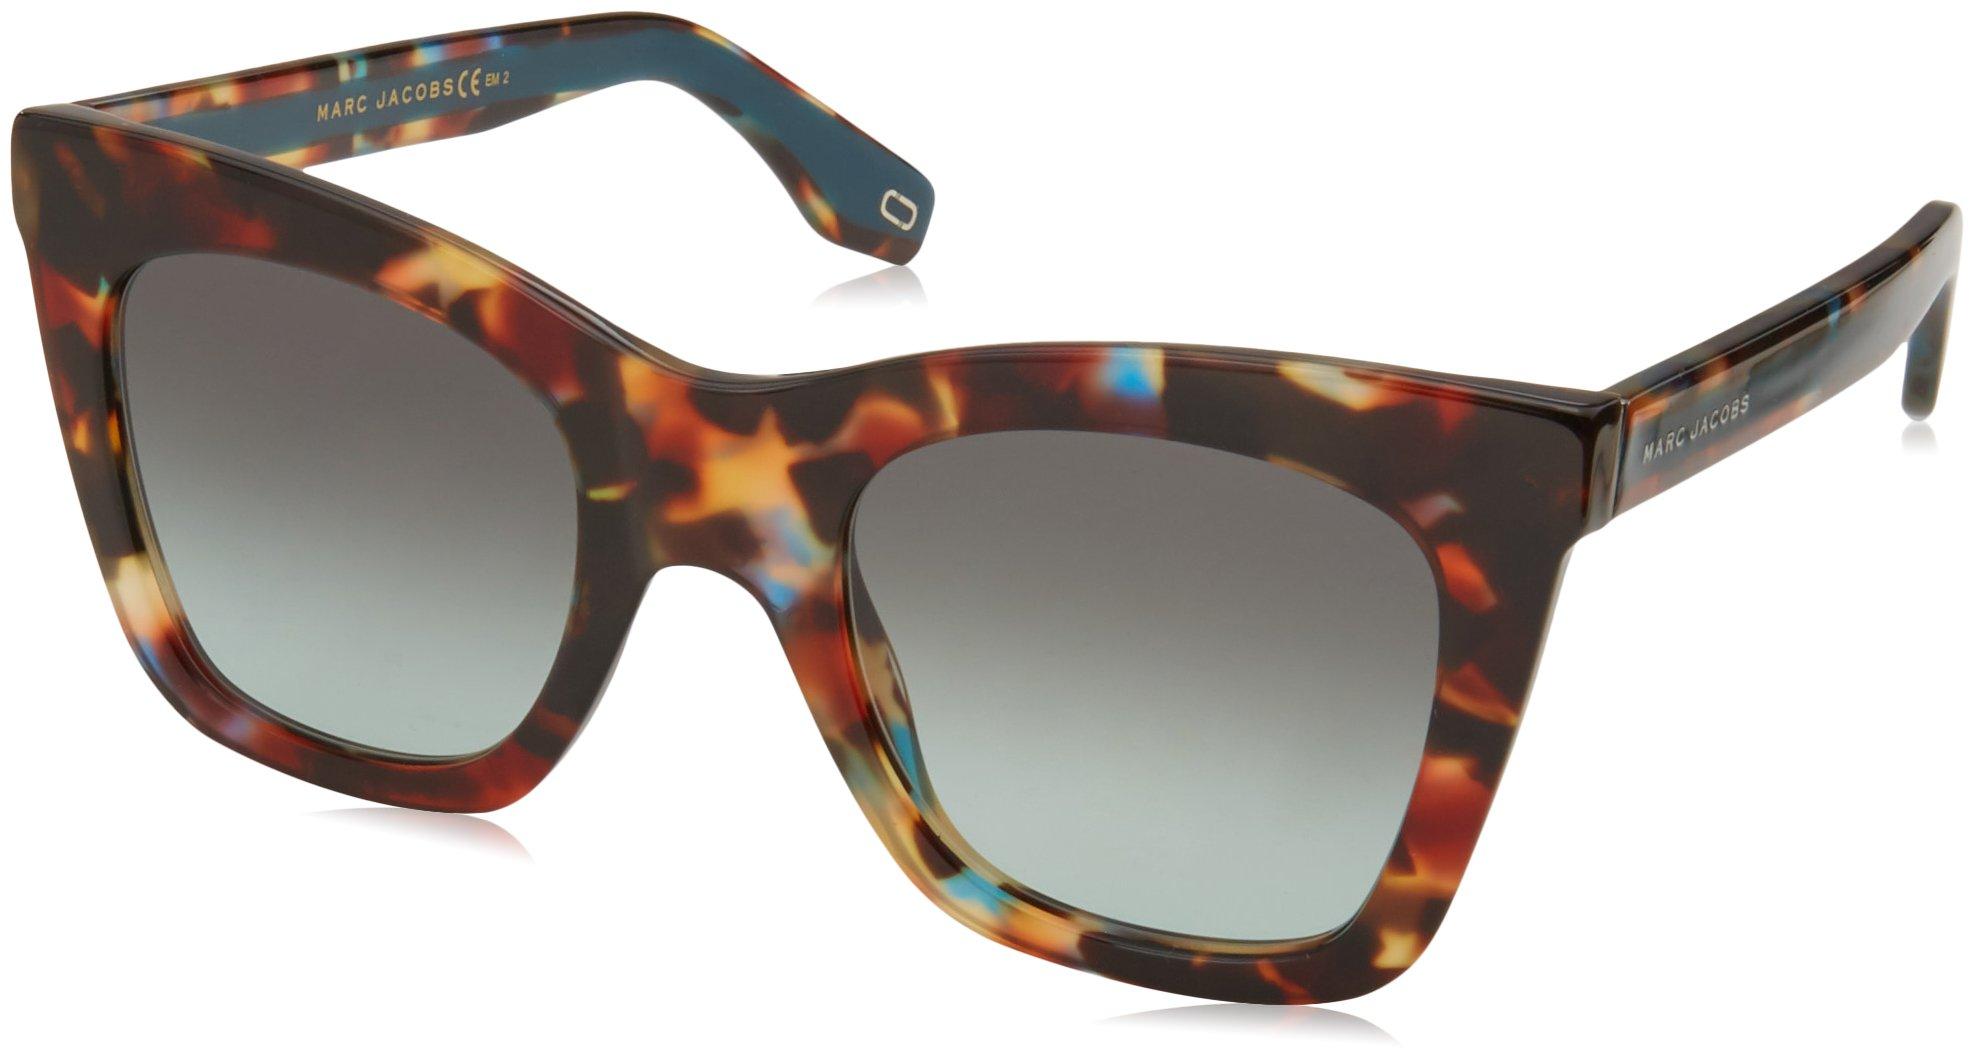 Marc Jacobs Women's Marc279s Cateye Sunglasses, Havnturqu, 50 mm